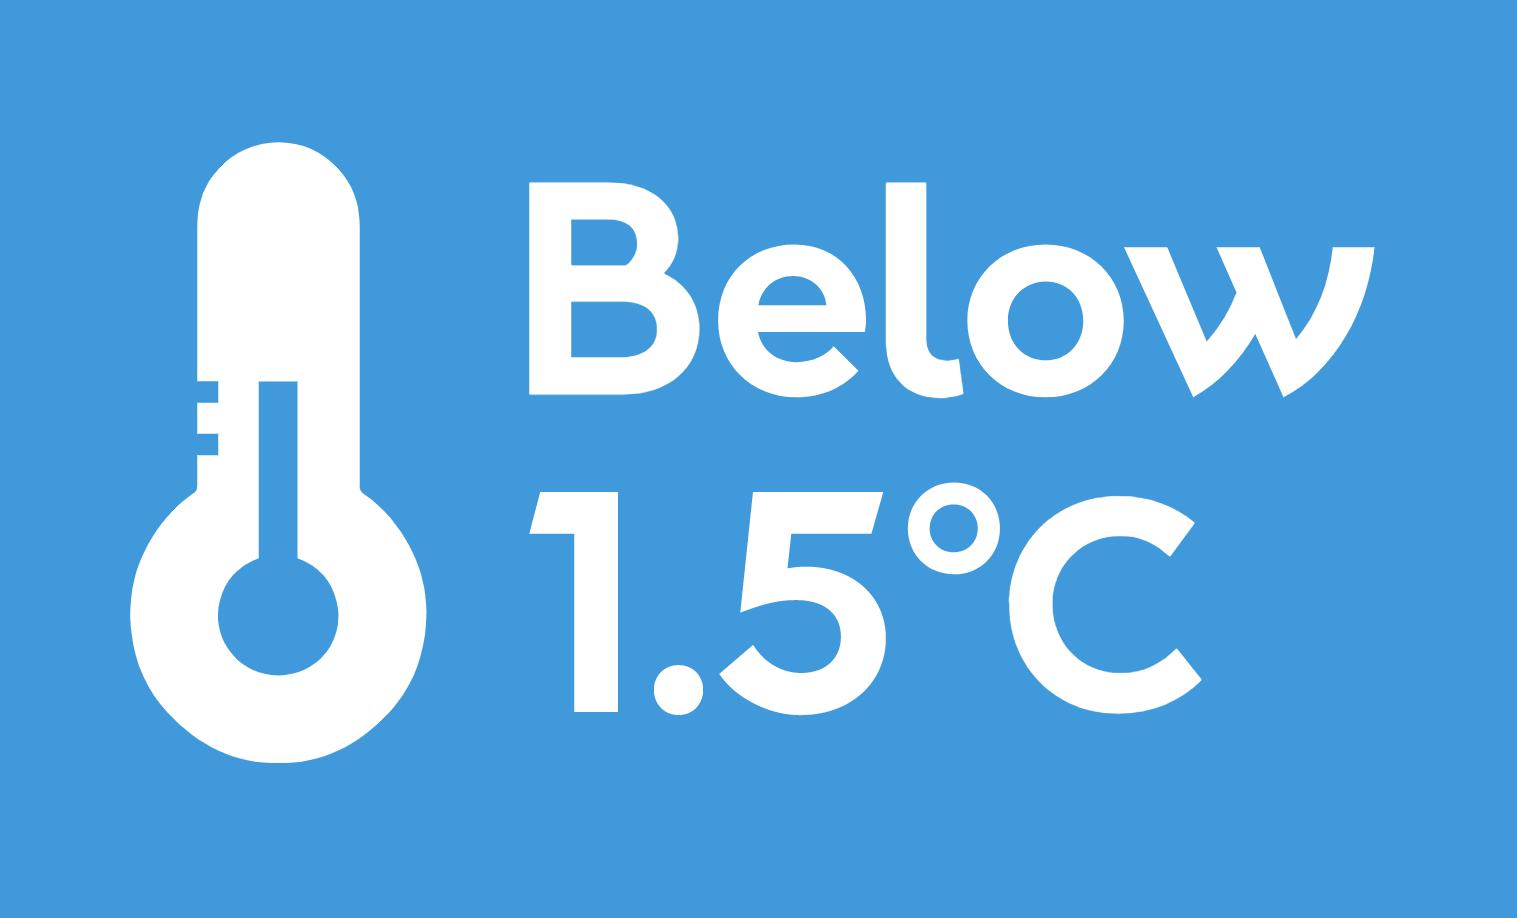 Below 2 degrees